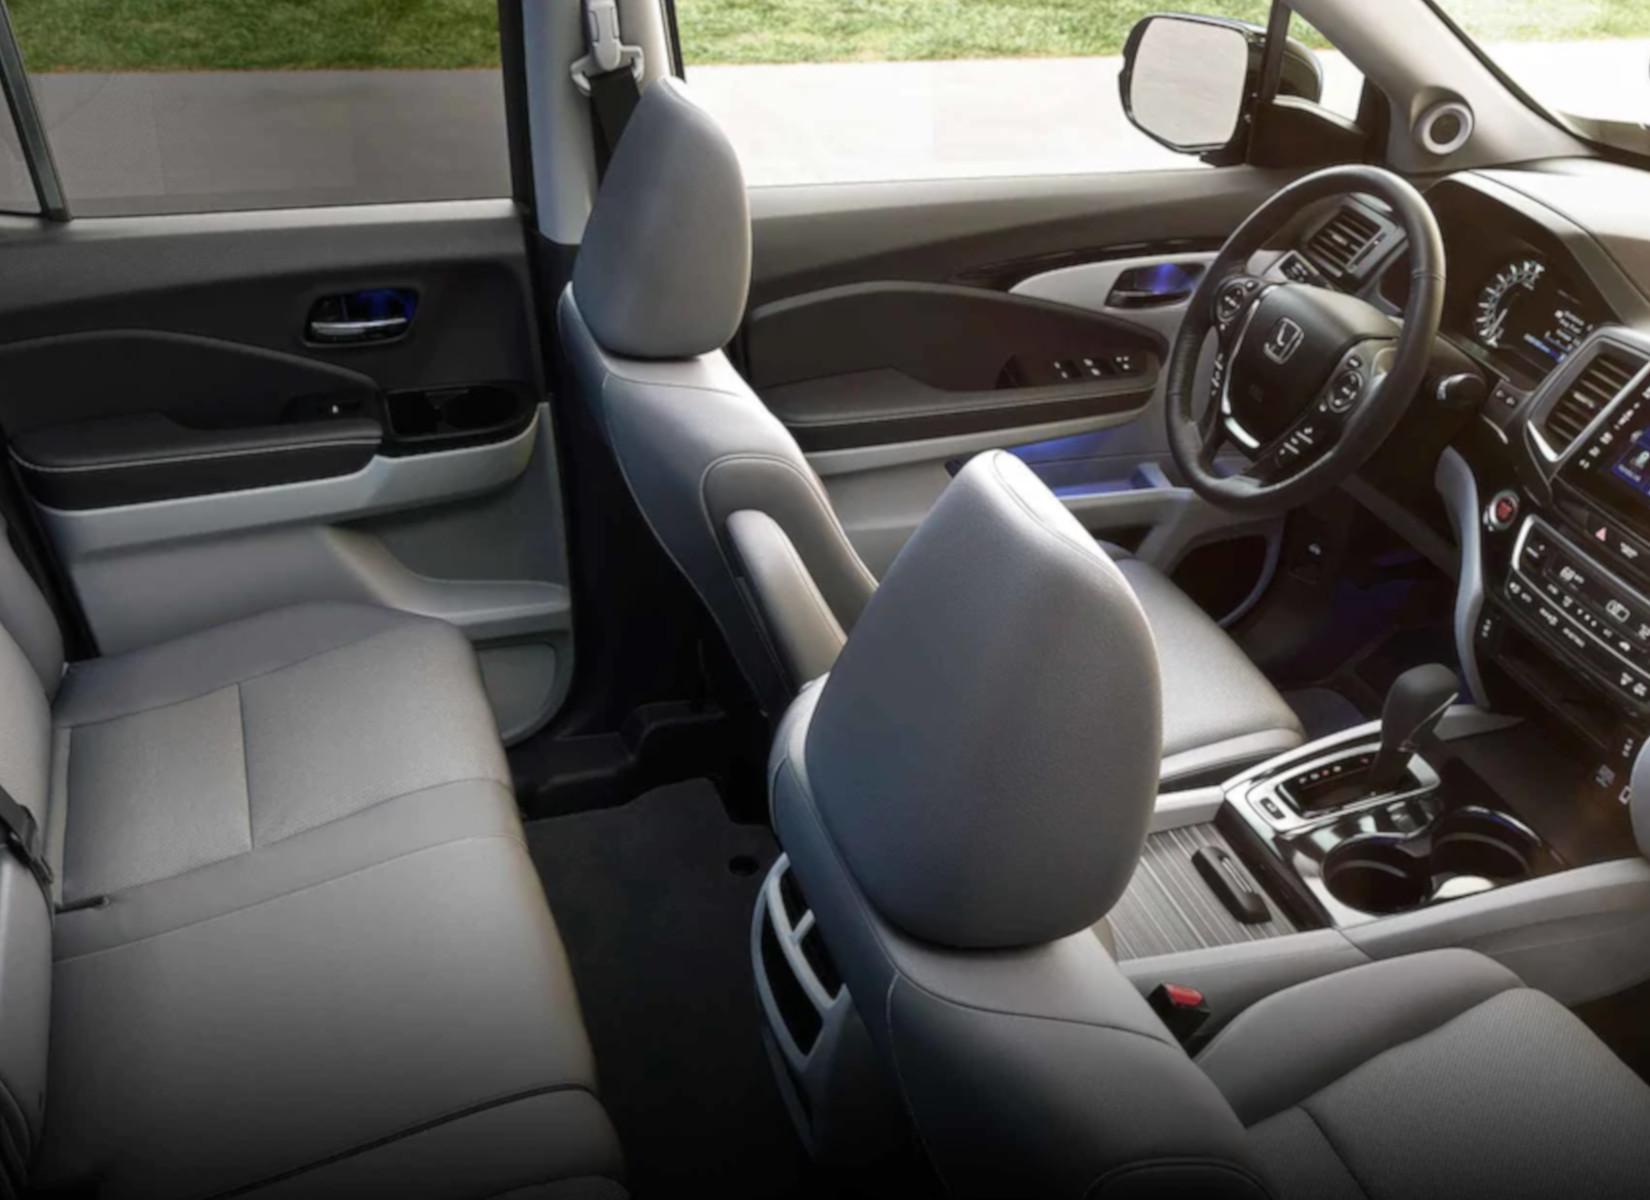 The spacious interior of the 2019 Honda Ridgeline